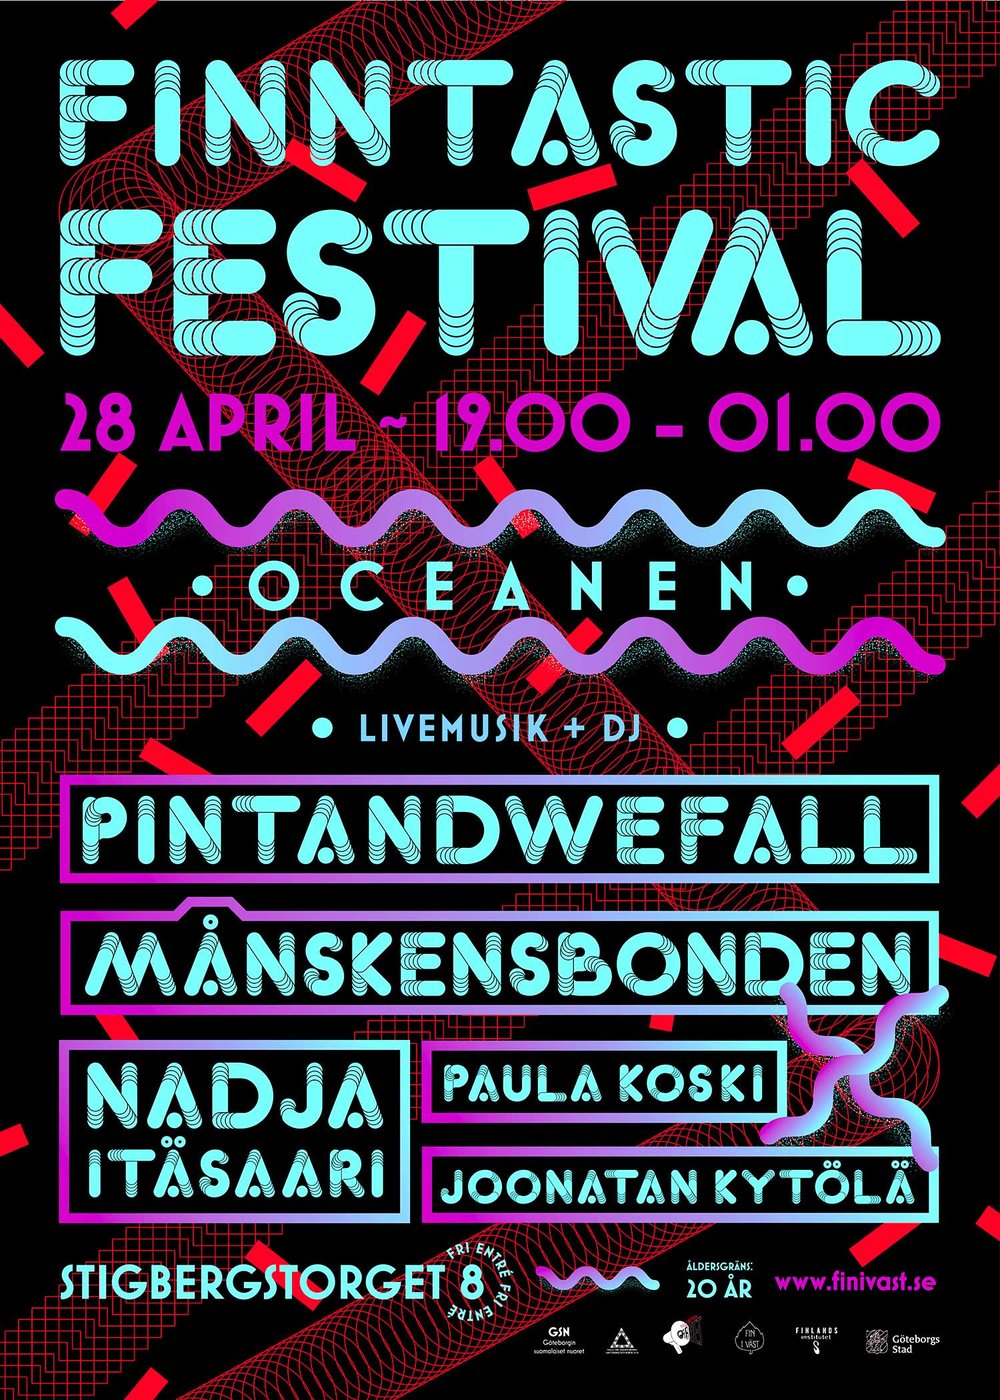 Finntastic Festival Göteborg